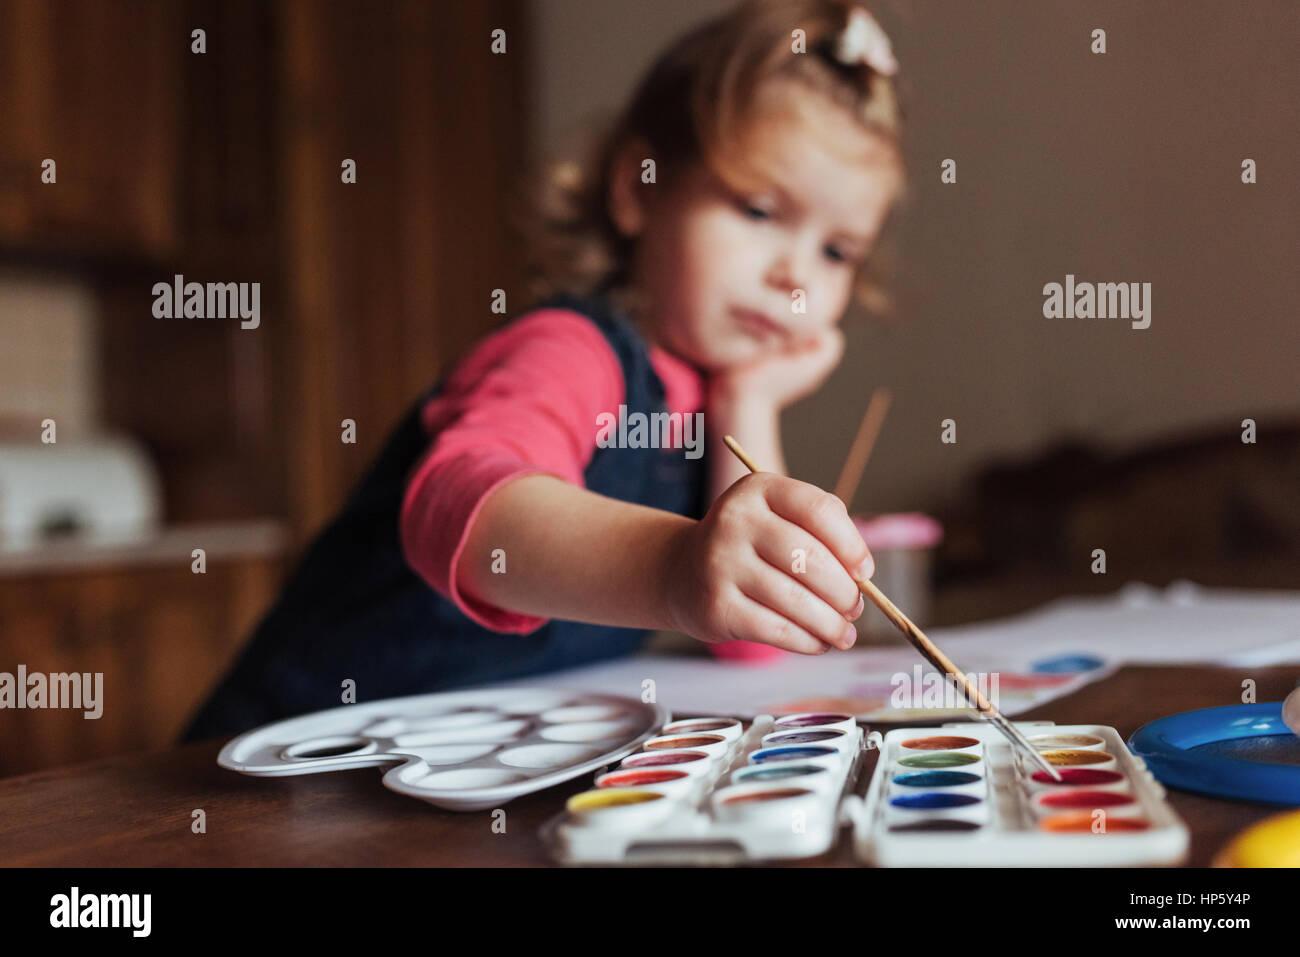 Bonitinha feliz menina, adorável ingere, pintura com tungst Imagens de Stock